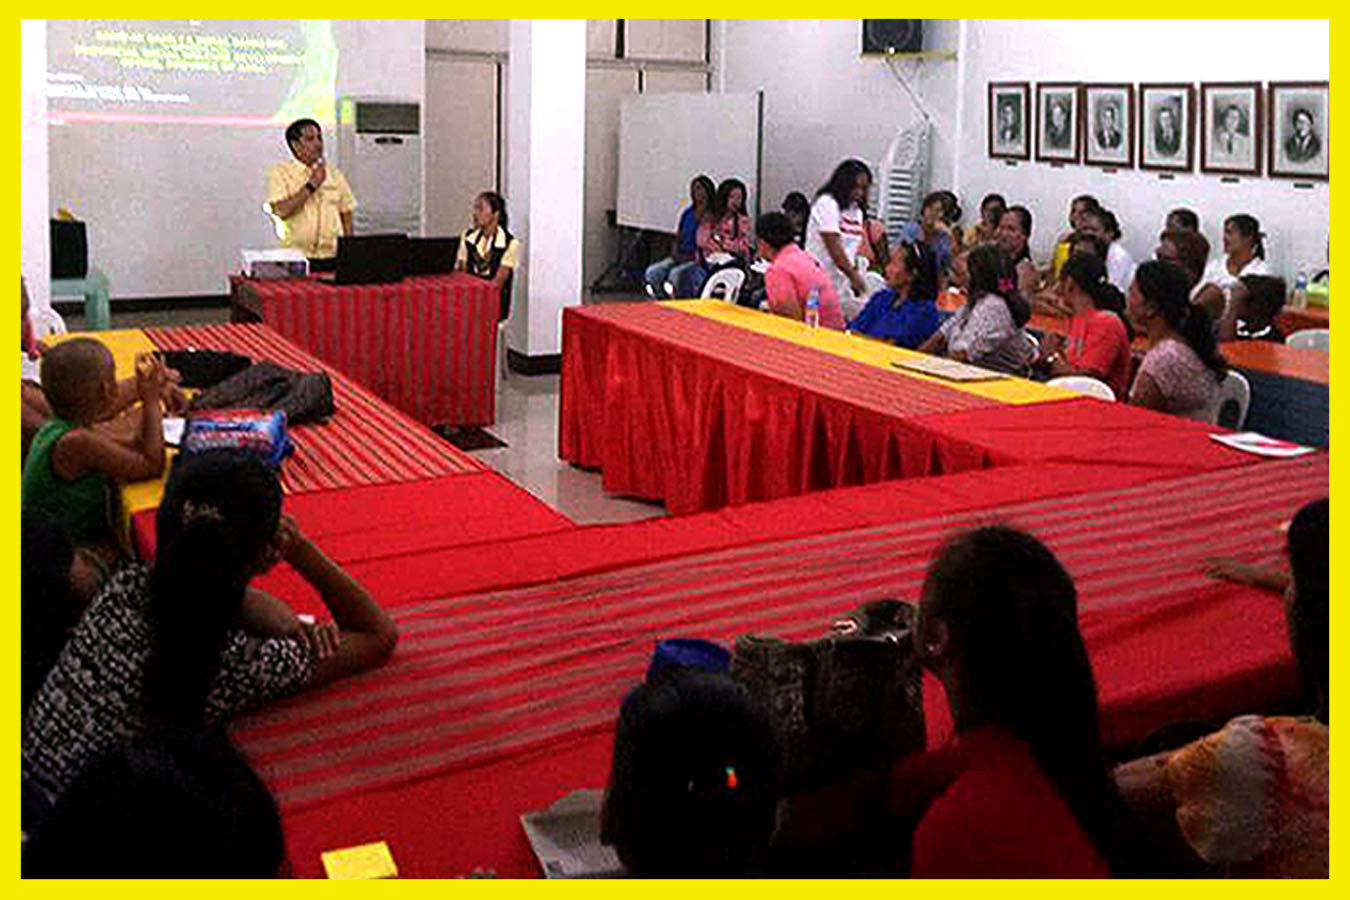 Rang-ay Bangued Senior Manager John Marinius De La Cruz addressing women from different town of Abra HEaded by Decimia Cabang